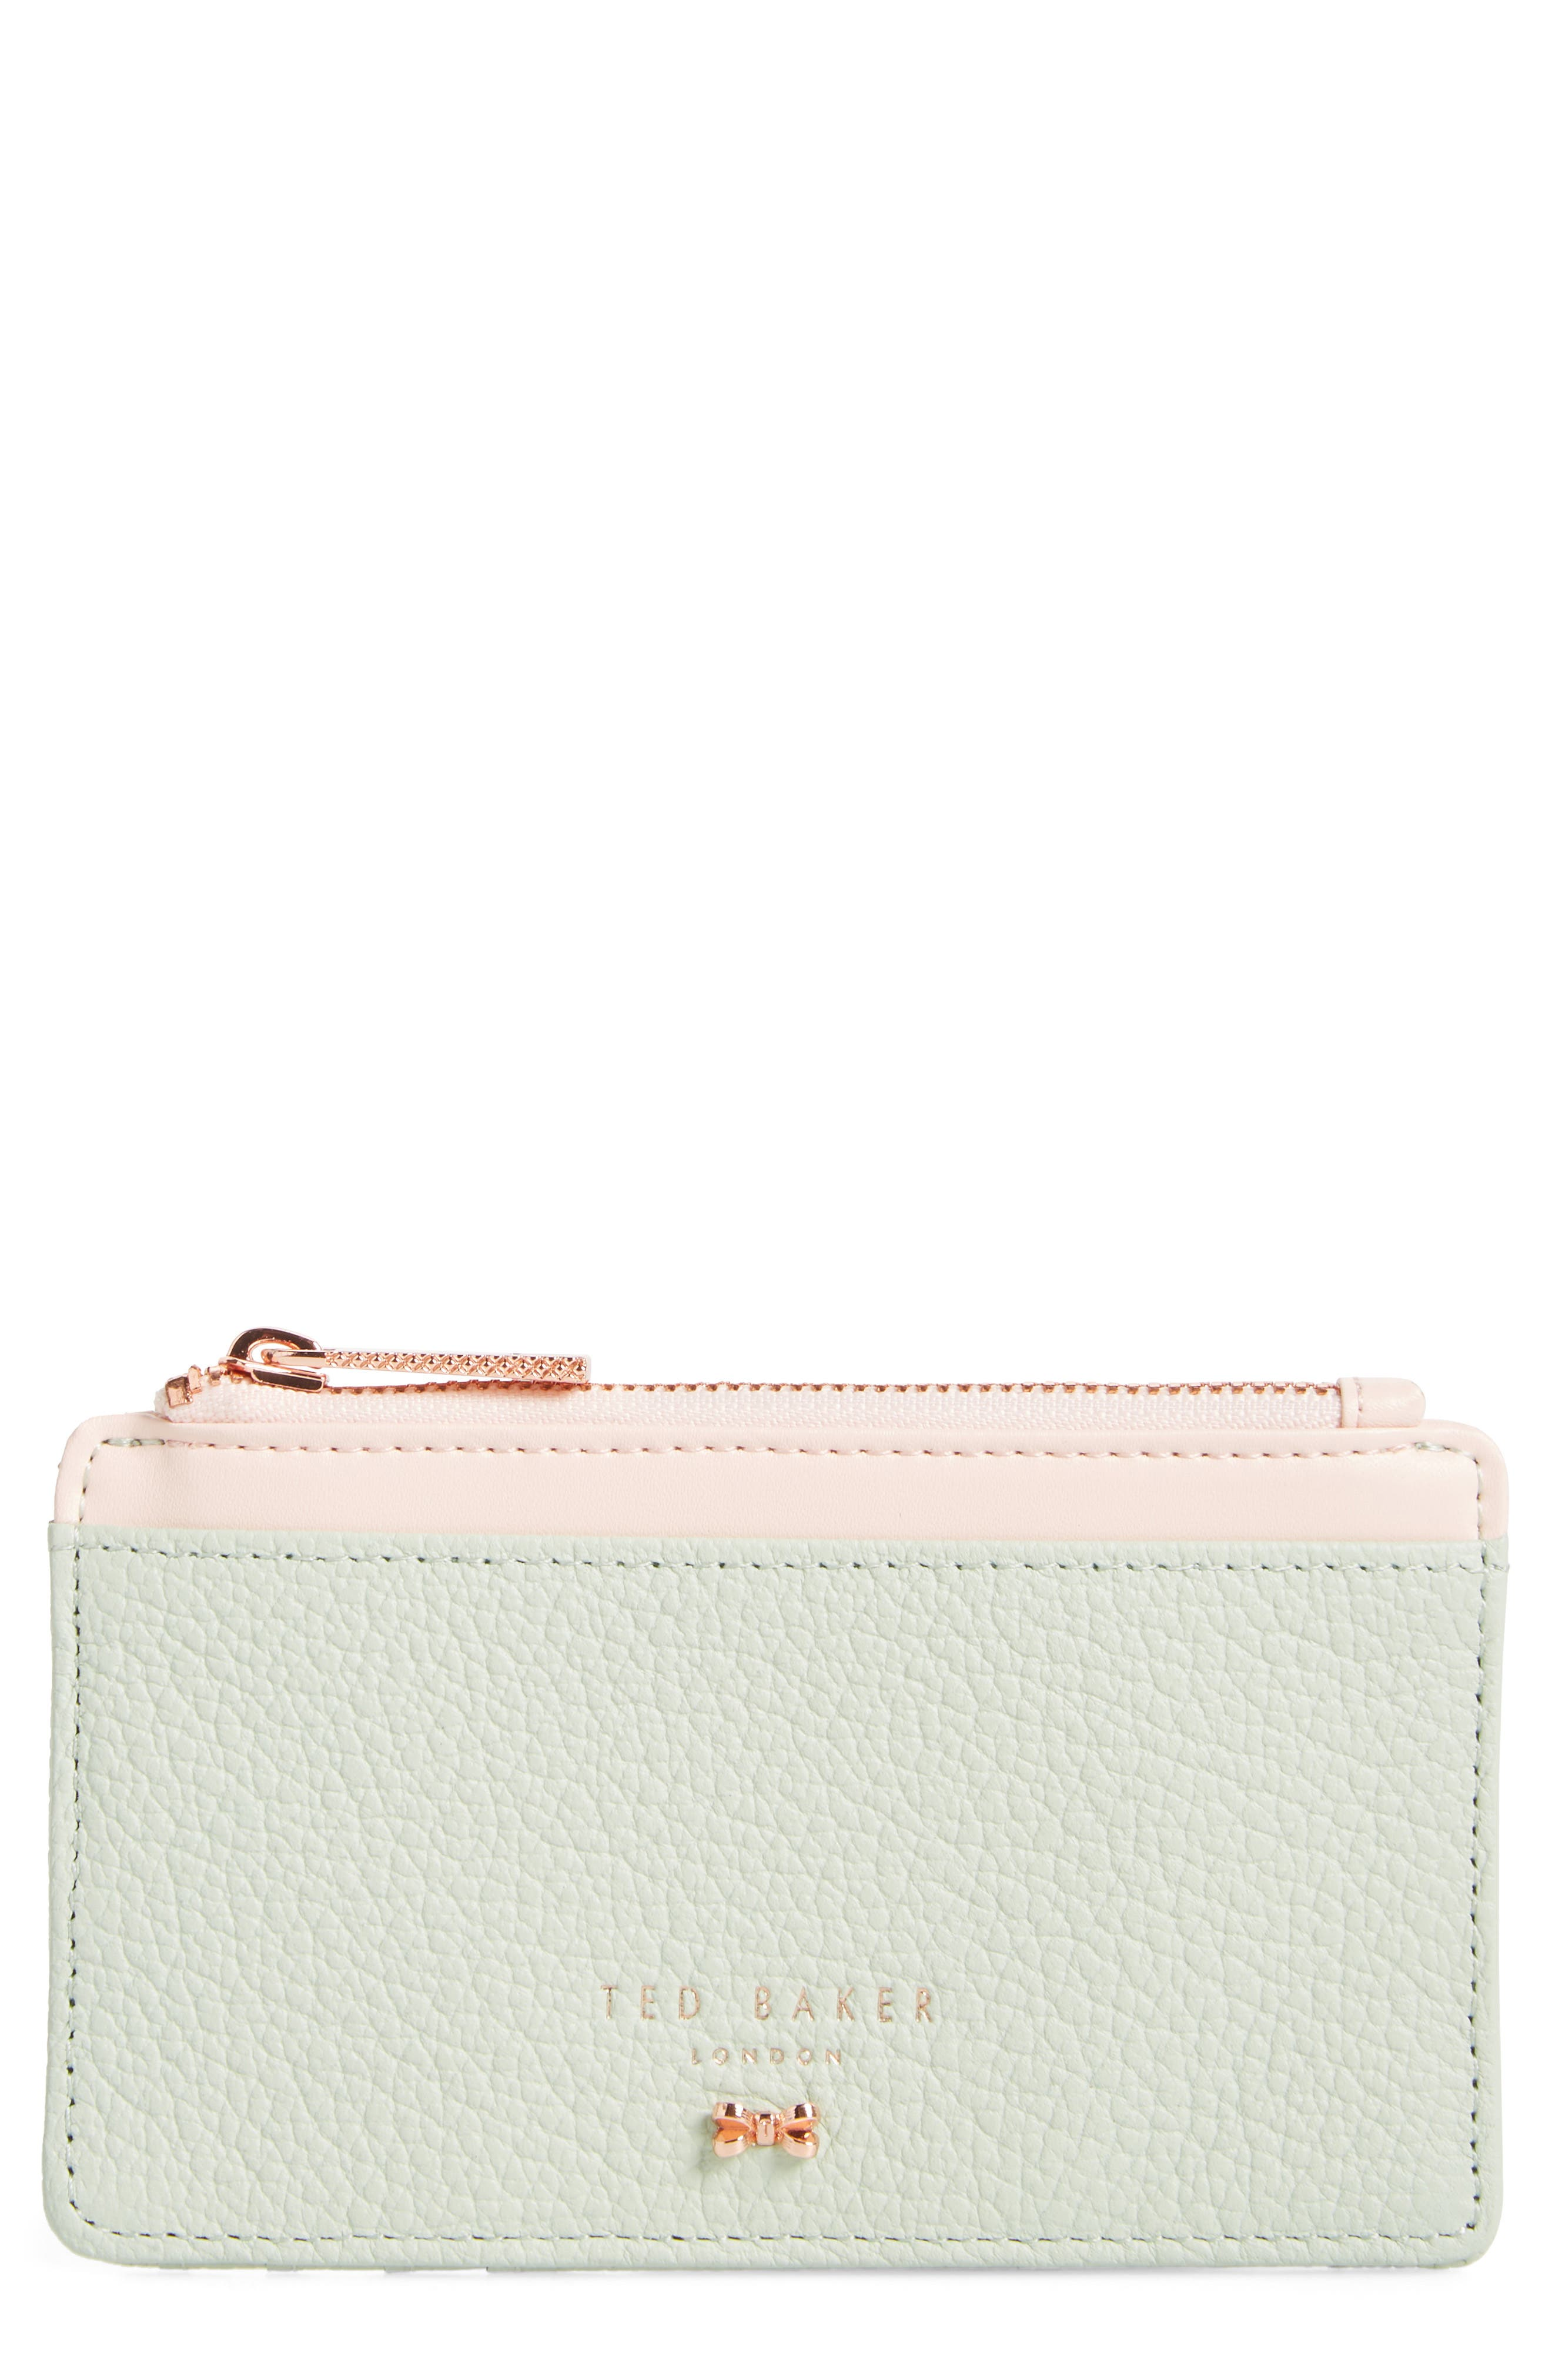 Alica Top Zip Leather Card Case,                         Main,                         color, 300